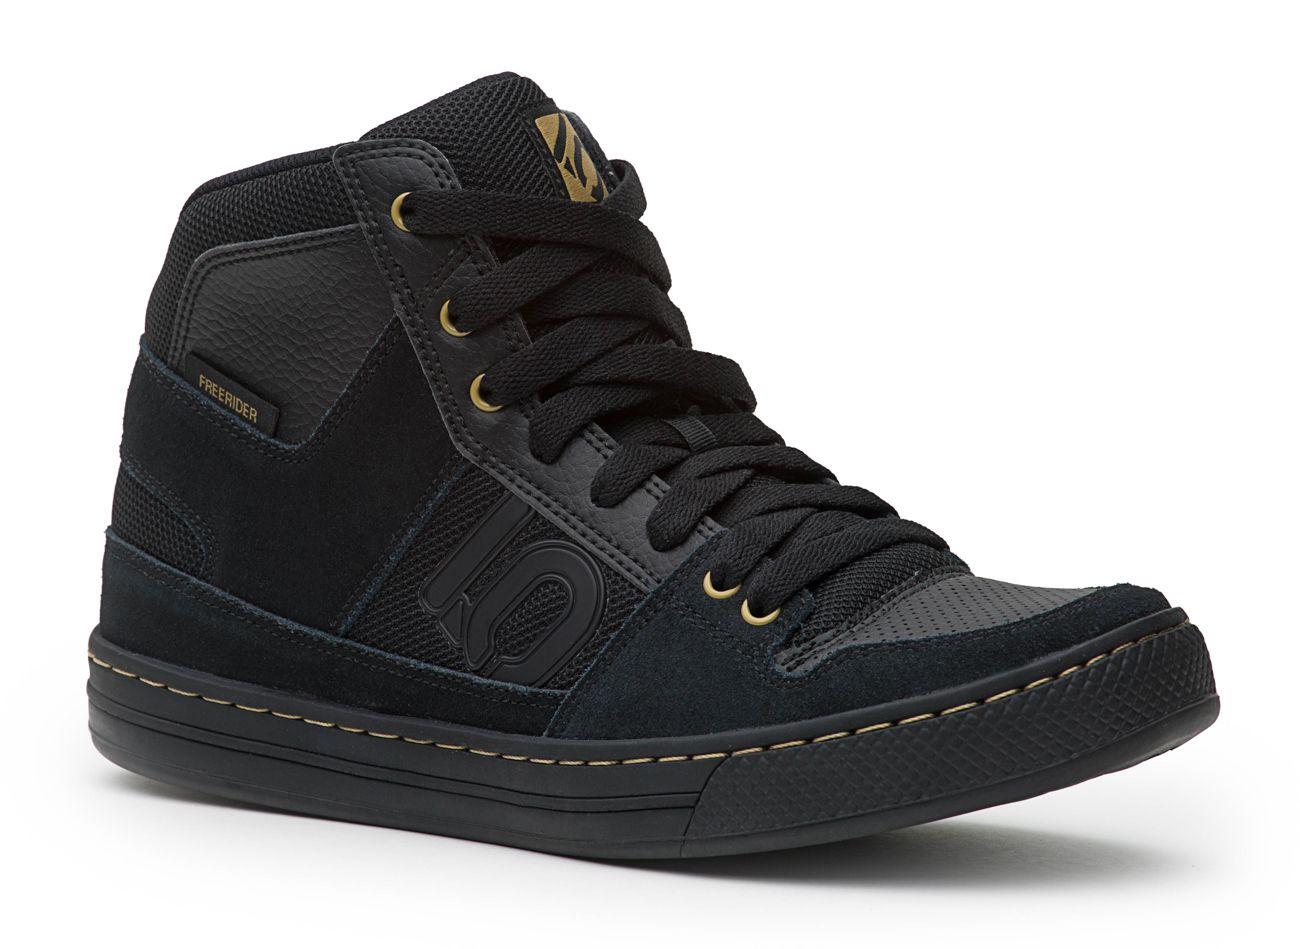 Five Ten Freerider High MTB Shoes Black